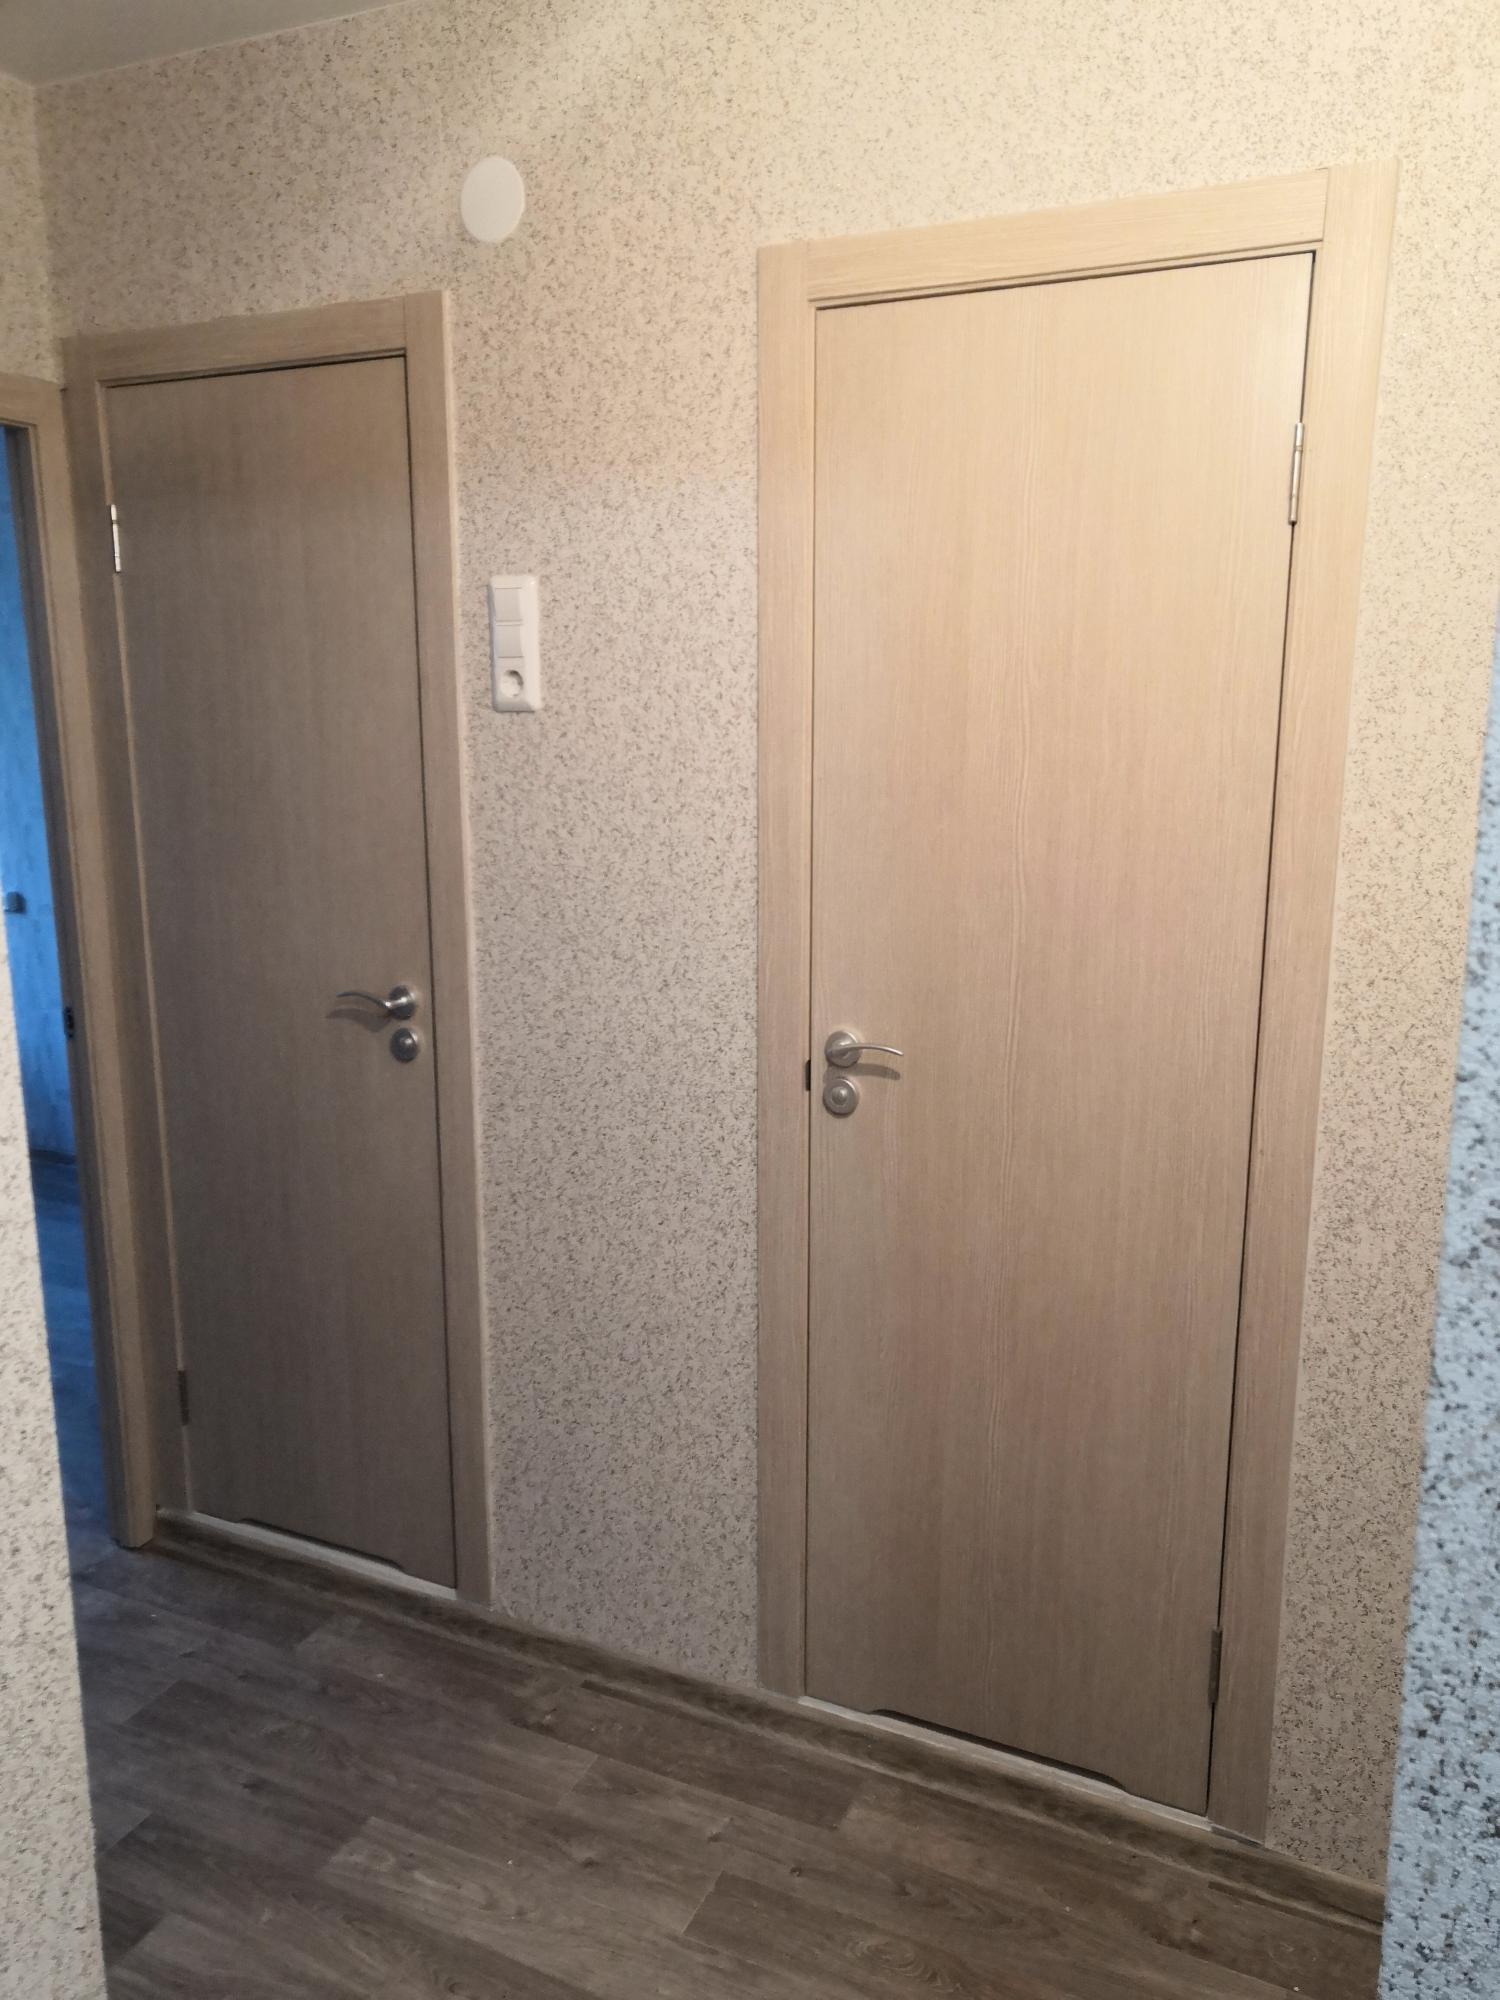 1к квартира улица Партизана Железняка, 59   13000   аренда в Красноярске фото 6